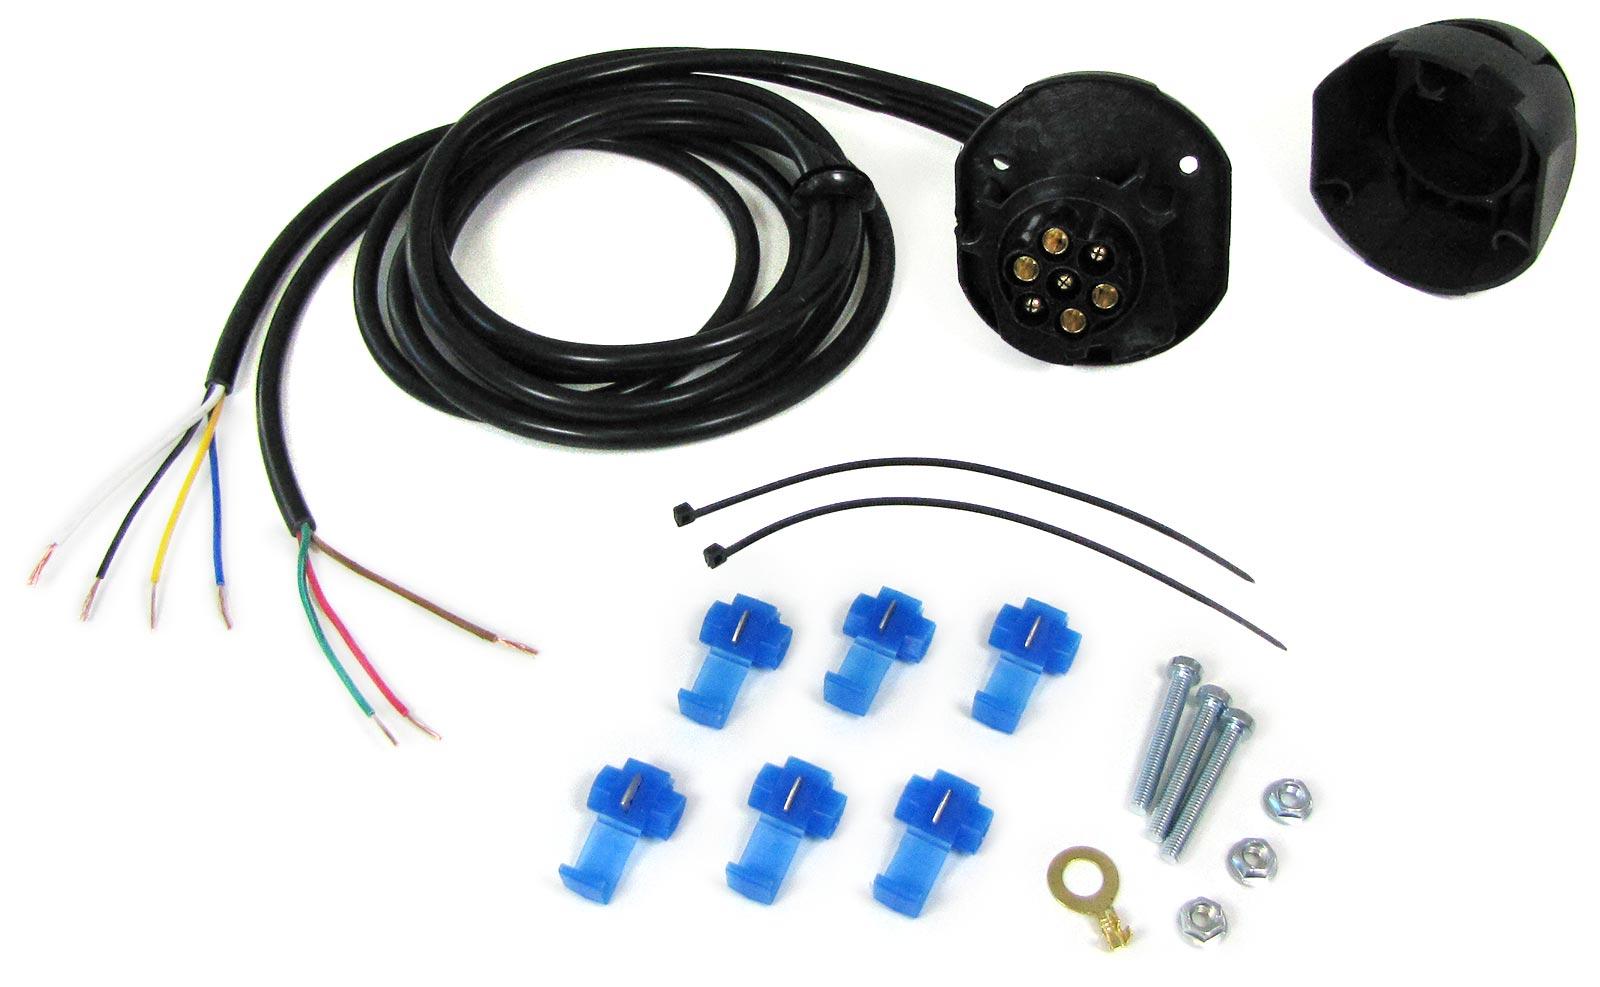 Kabel VerlÄngerung Adapter Set Universal 1, 5 Meter 7 Polig Auto ...